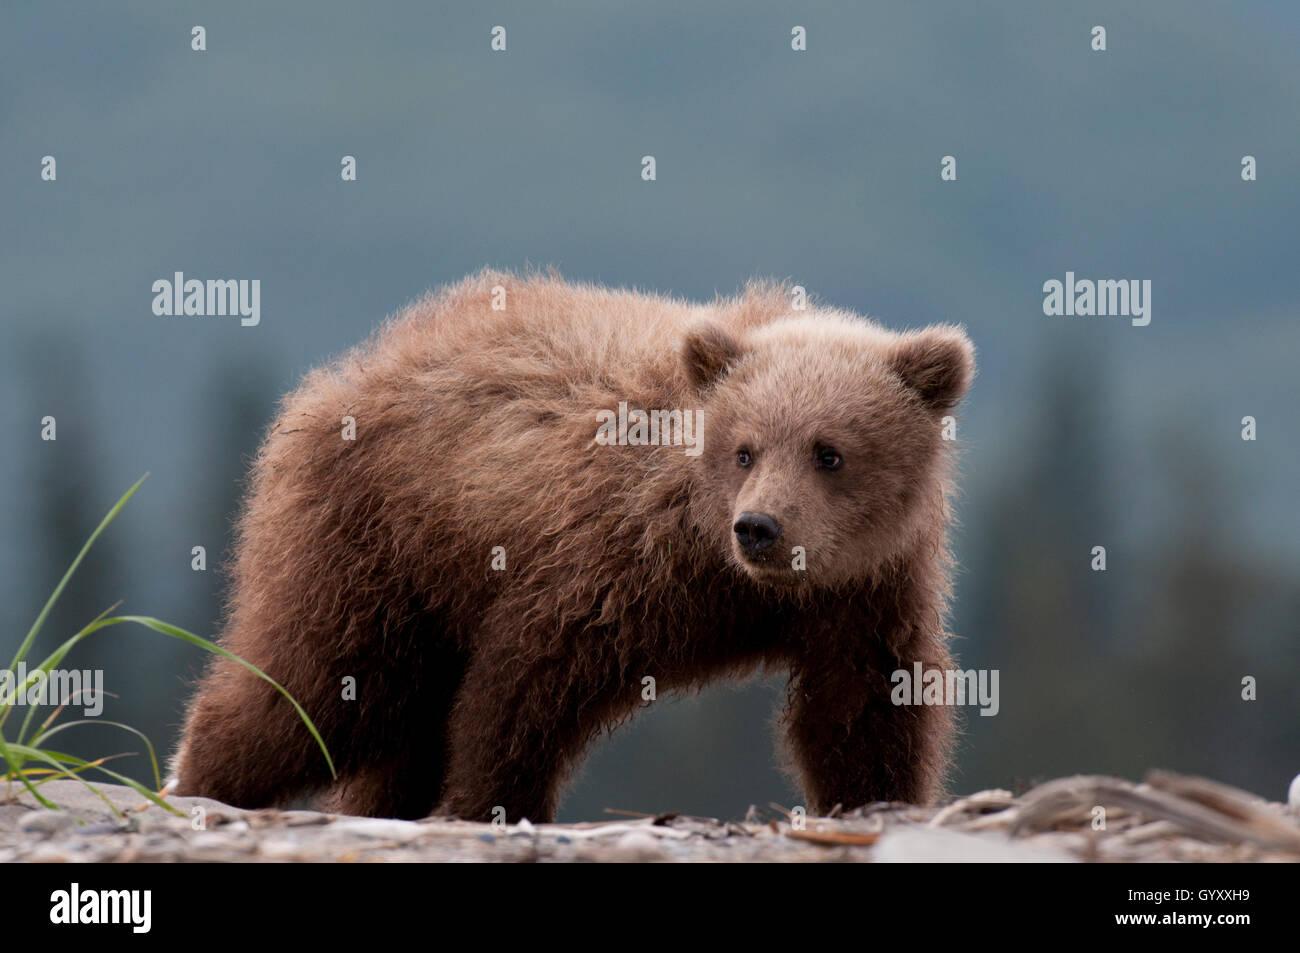 Brown bear cub (Ursus arctos) in Lake Clark National Park, Alaska - Stock Image